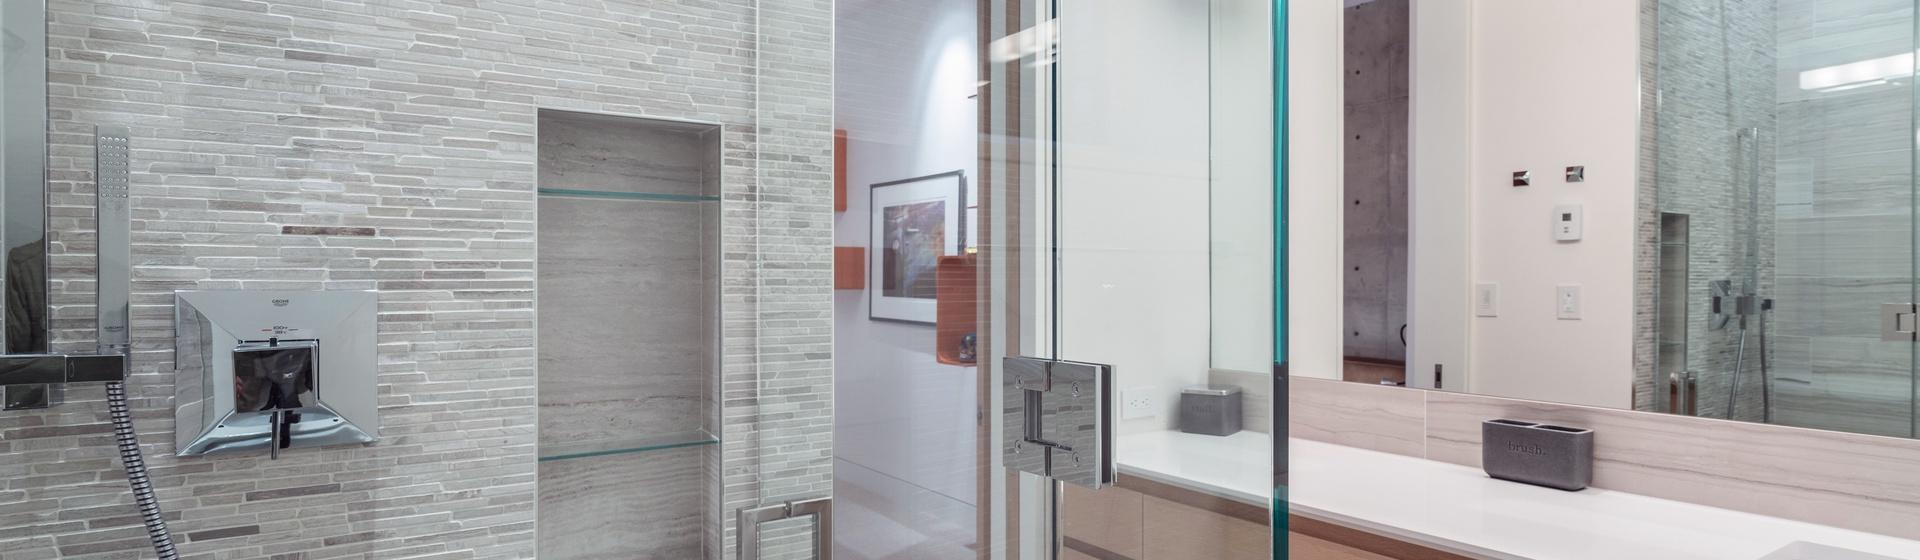 29-Telluride-The-Sunnyside-Downstairs-2-Full-Guest-Bathroom-Web.jpg